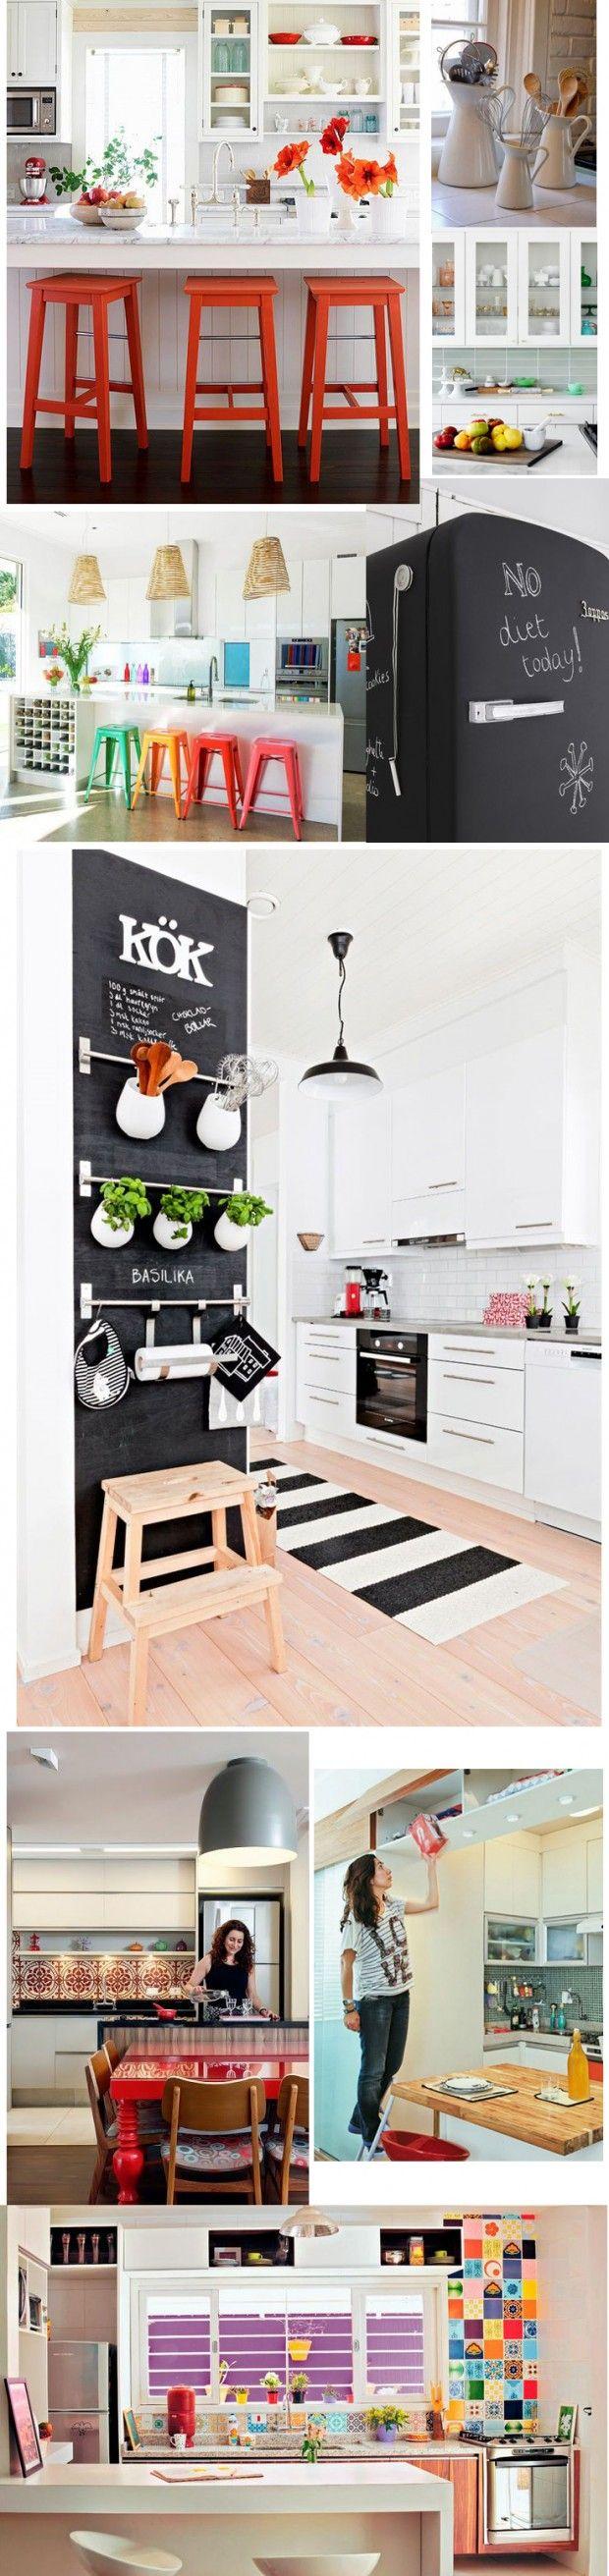 59 best cozinhas / jantar images on Pinterest | Dinner parties ...